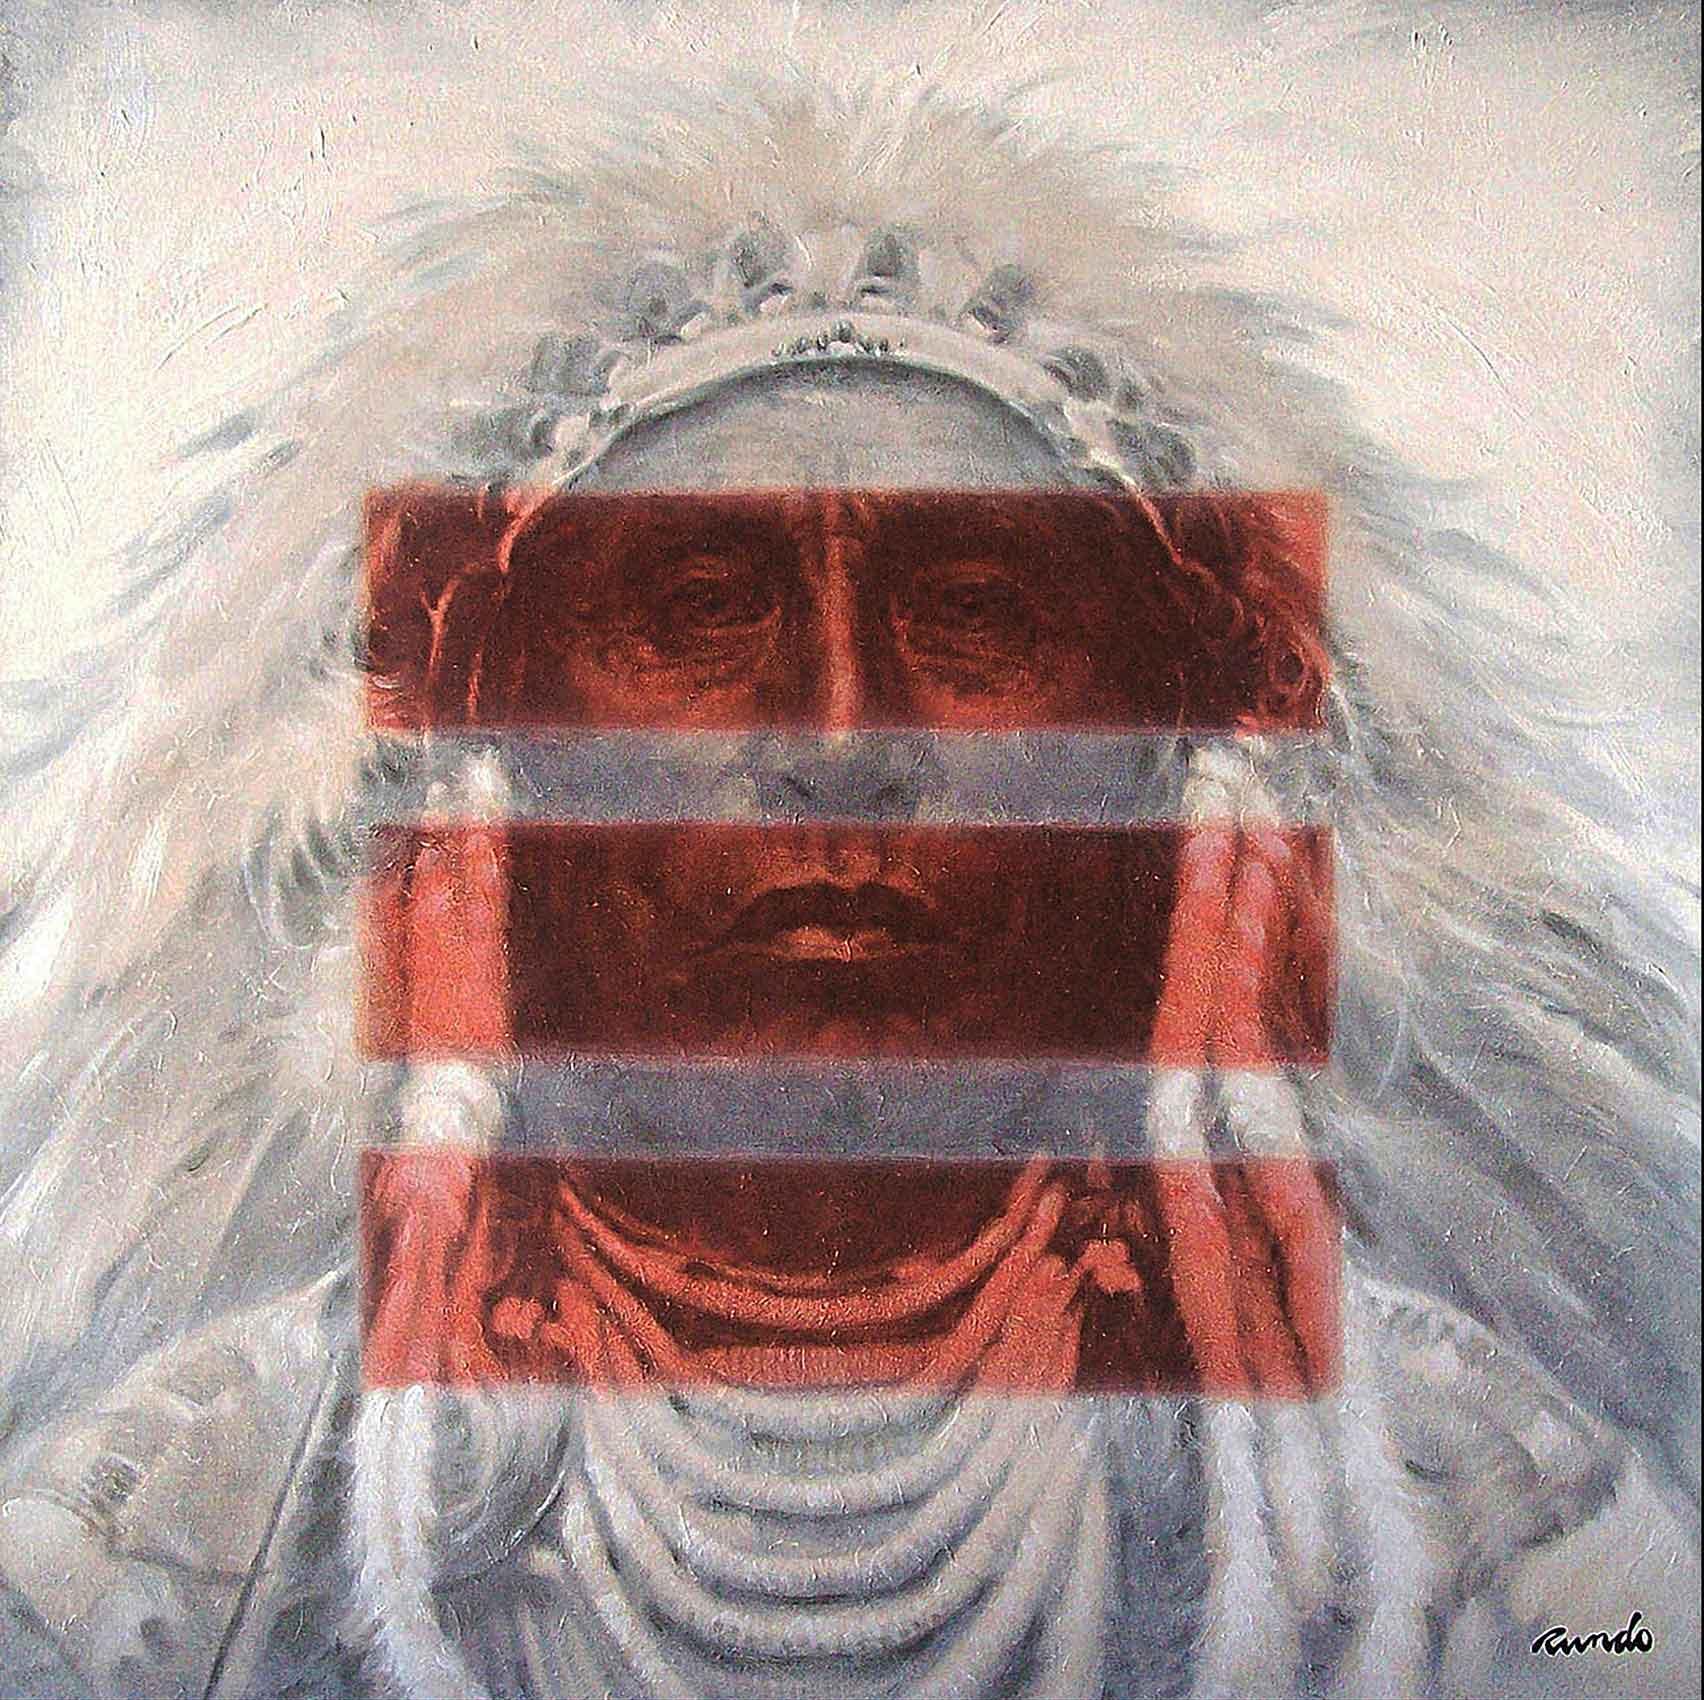 Ron Rundo / Chief Medicine Crow / Oil on Canvas